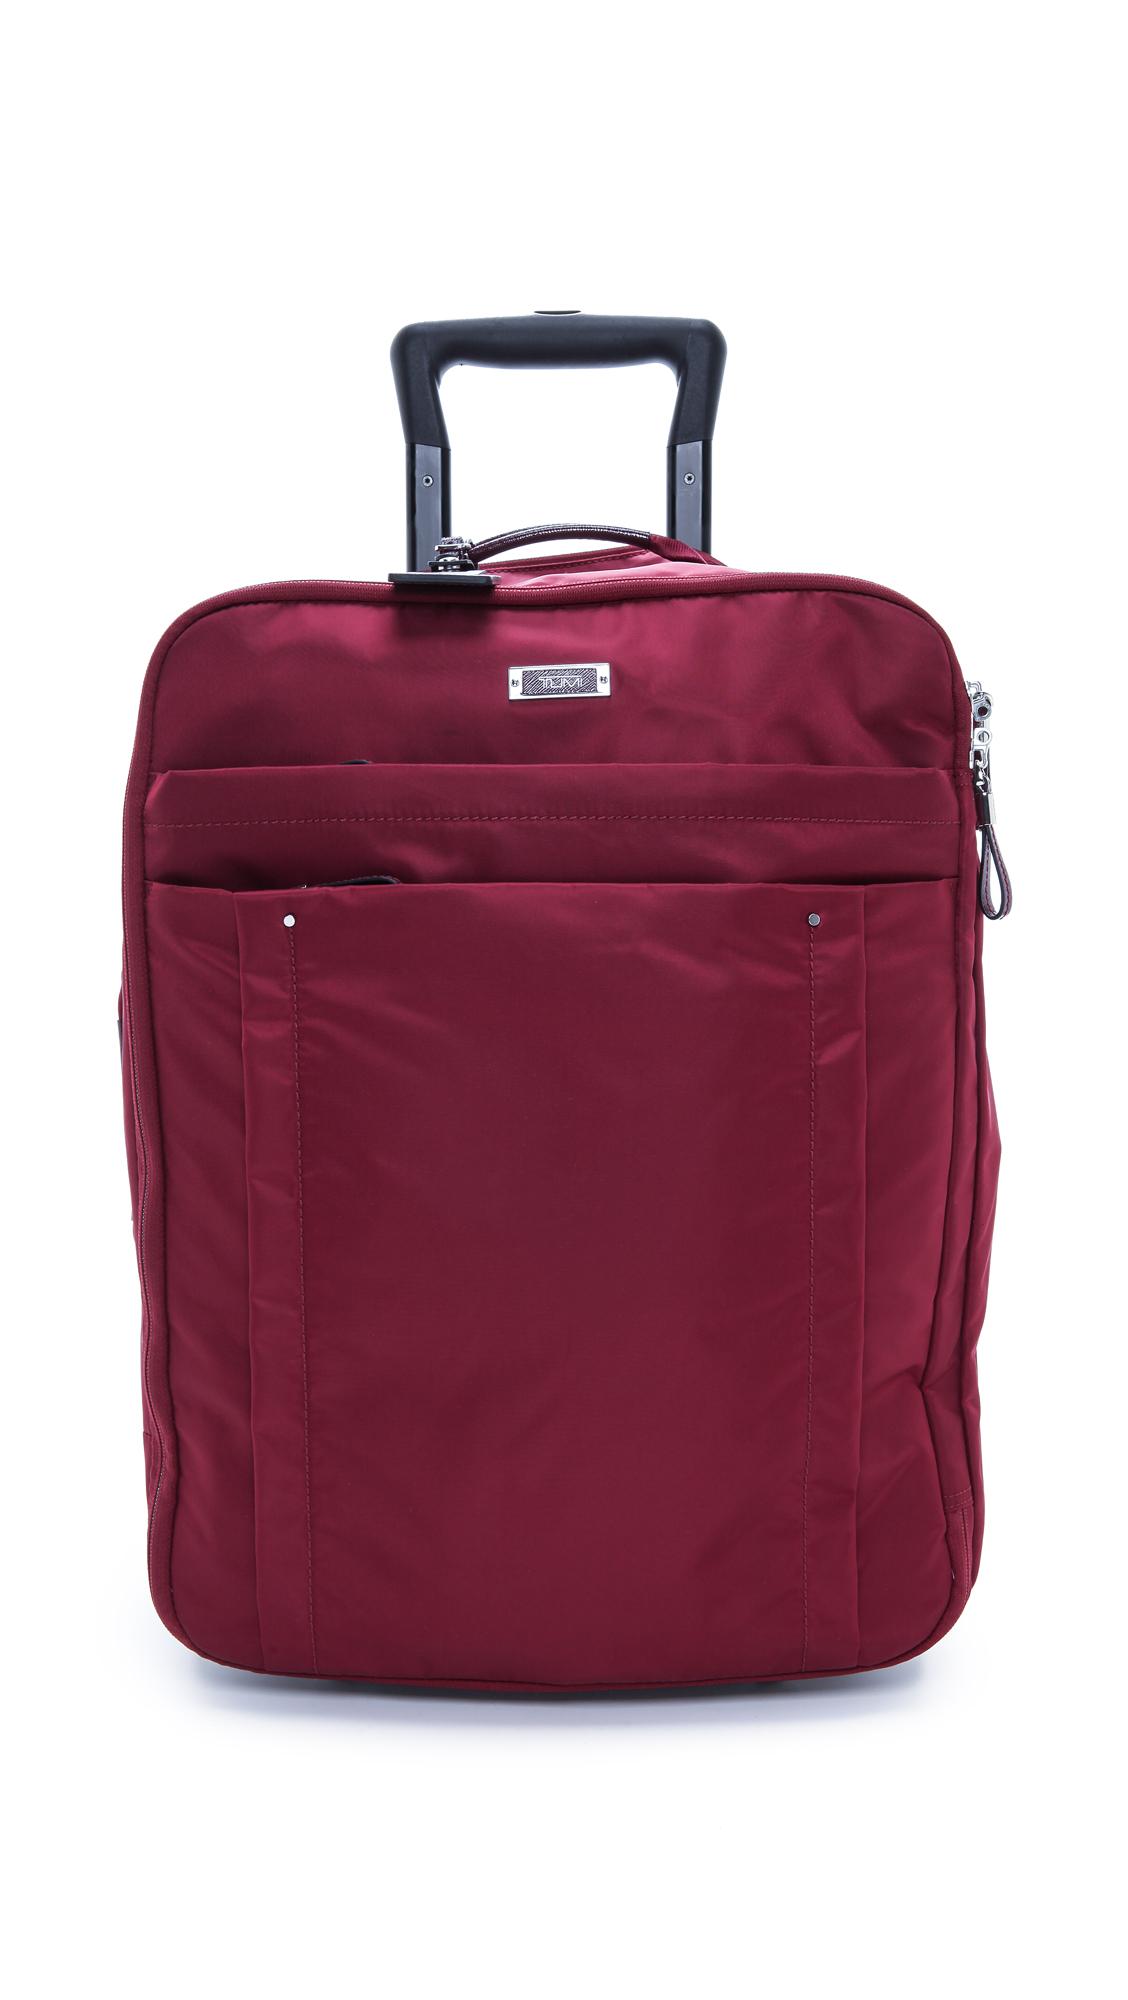 Tumi Super Leger International Carry On Luggage Garnet In